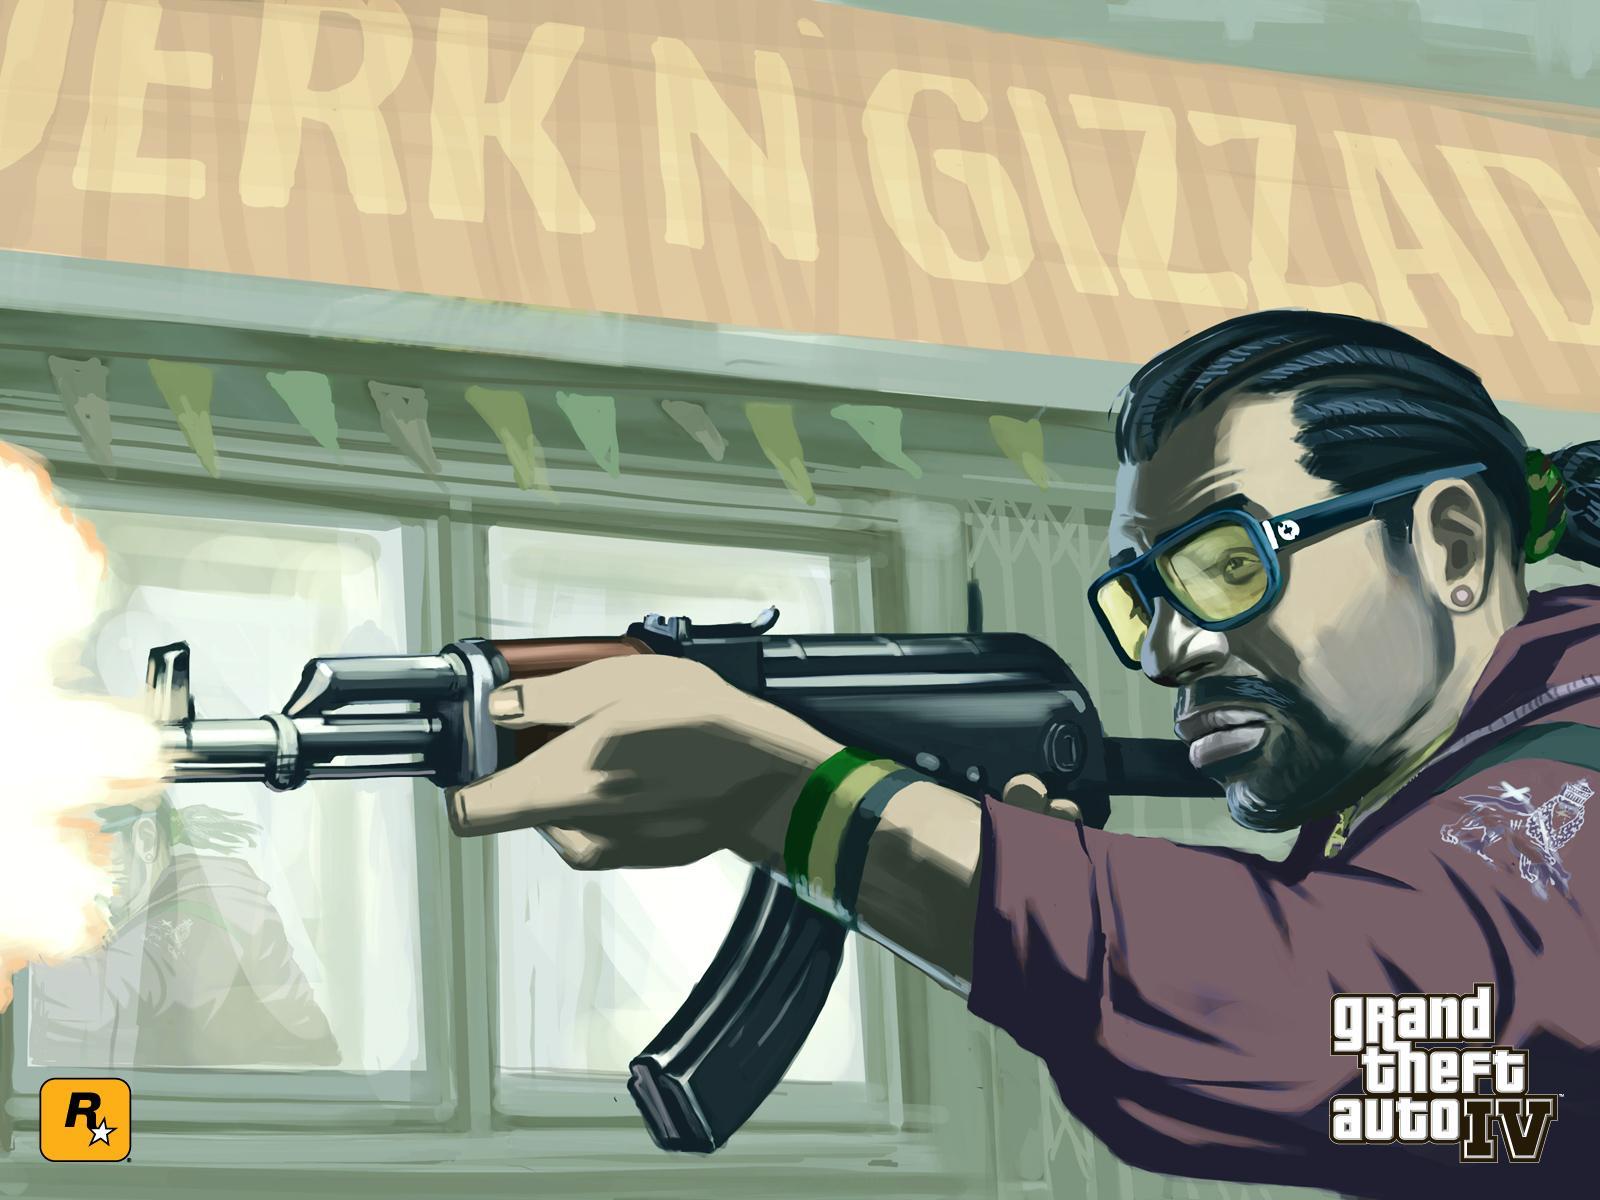 grand_theft_auto_4-9.jpg - Grand Theft Auto 4